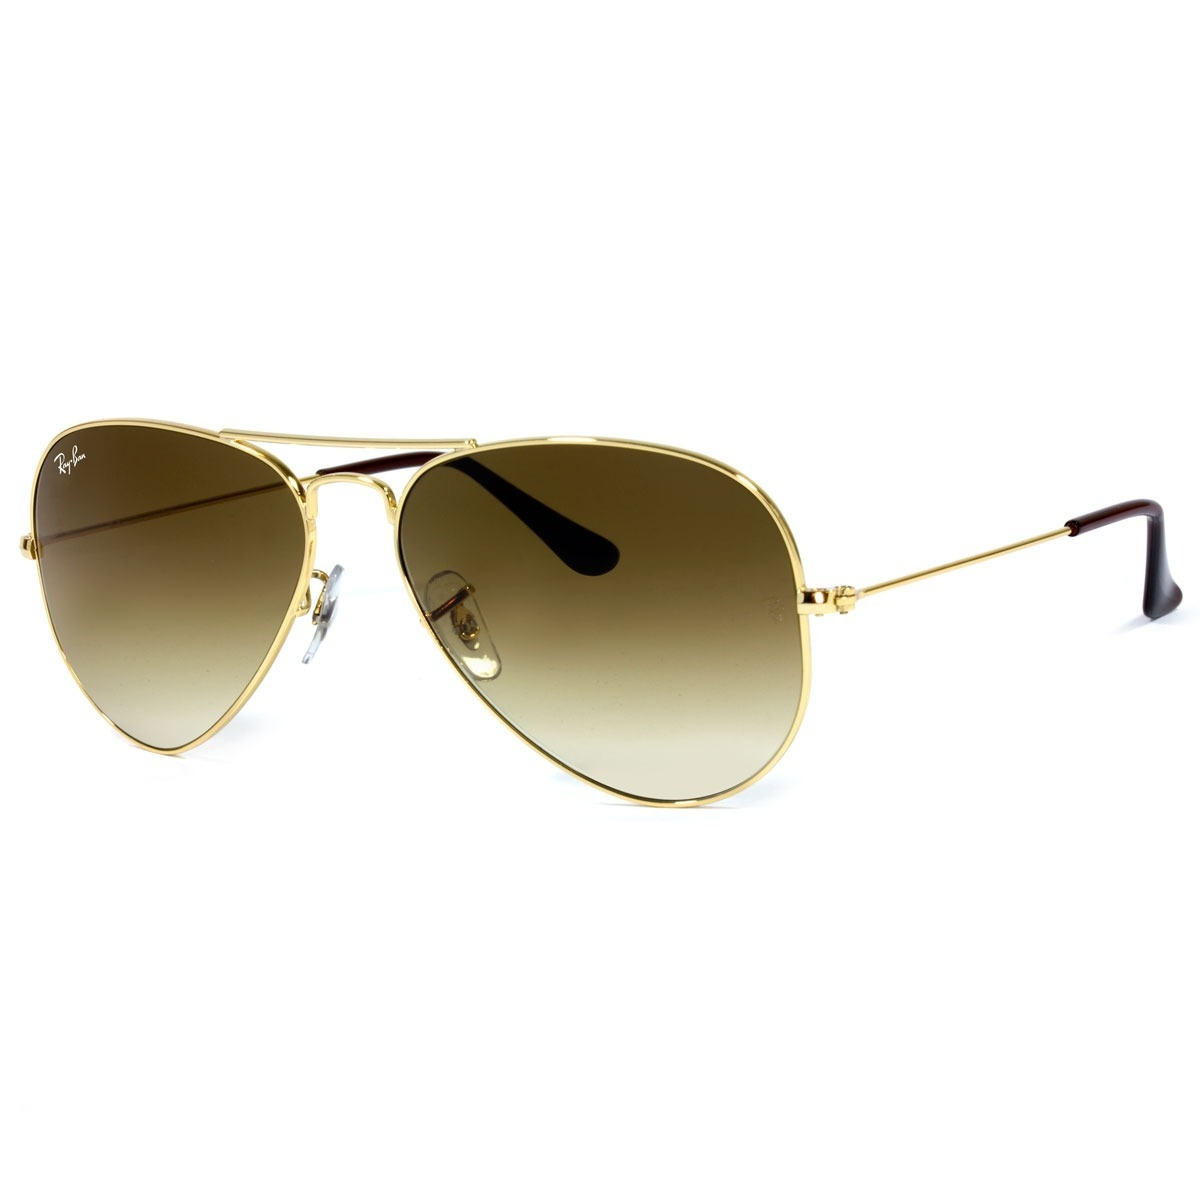 8fa3f58d1 óculos ray-ban aviador degrade original feminino masculino. Carregando zoom.